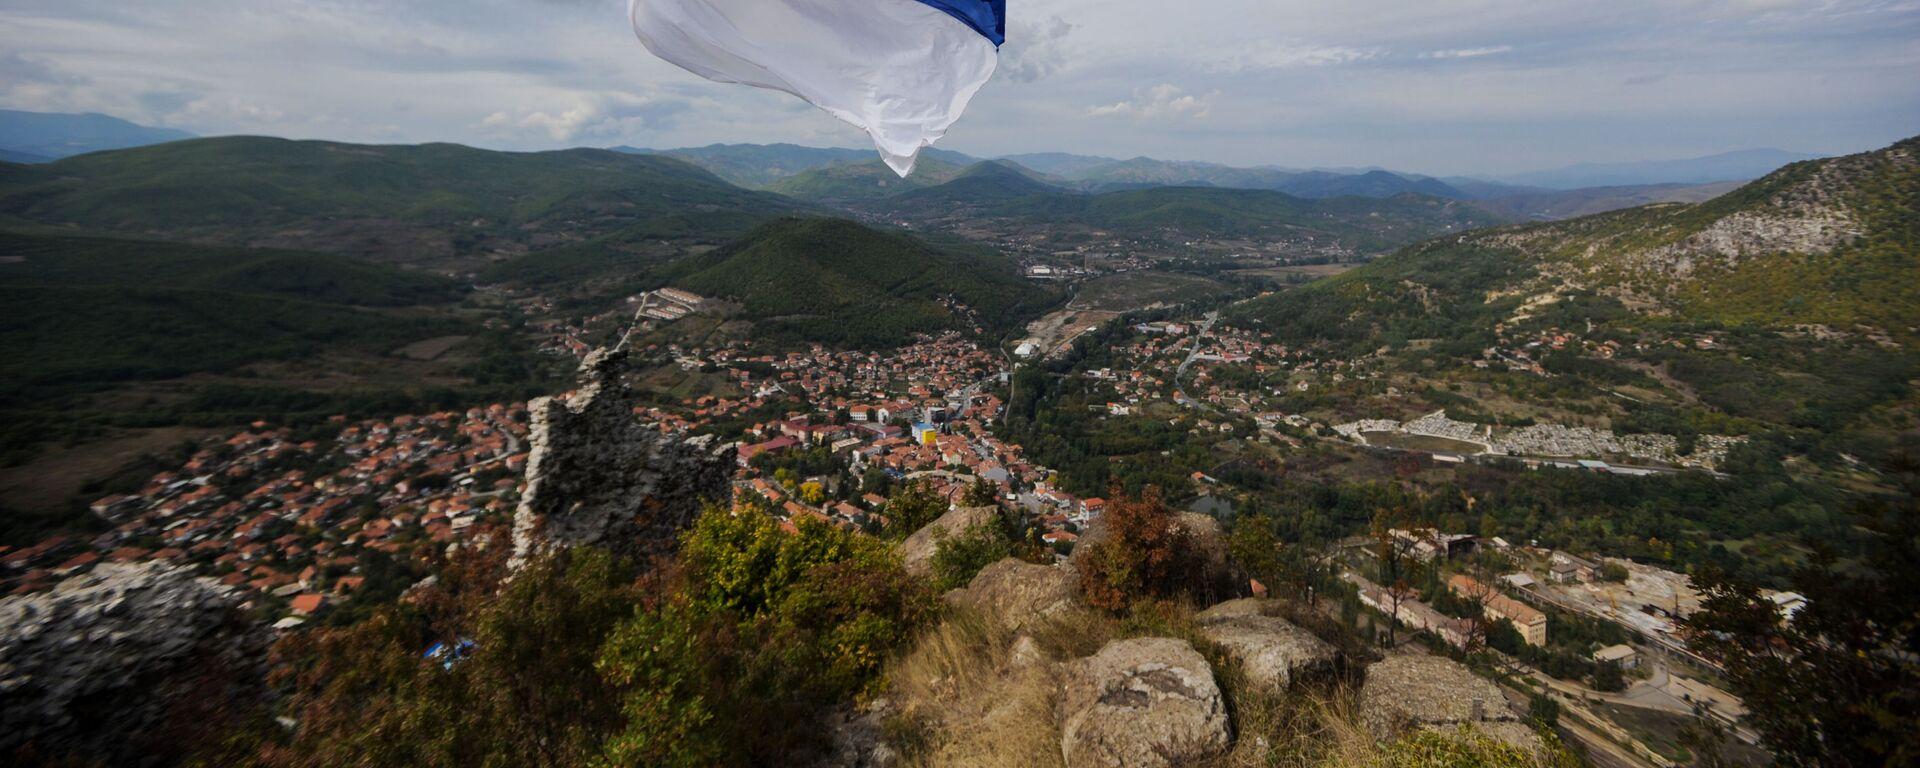 Косовска Митровица - Sputnik Србија, 1920, 28.09.2021